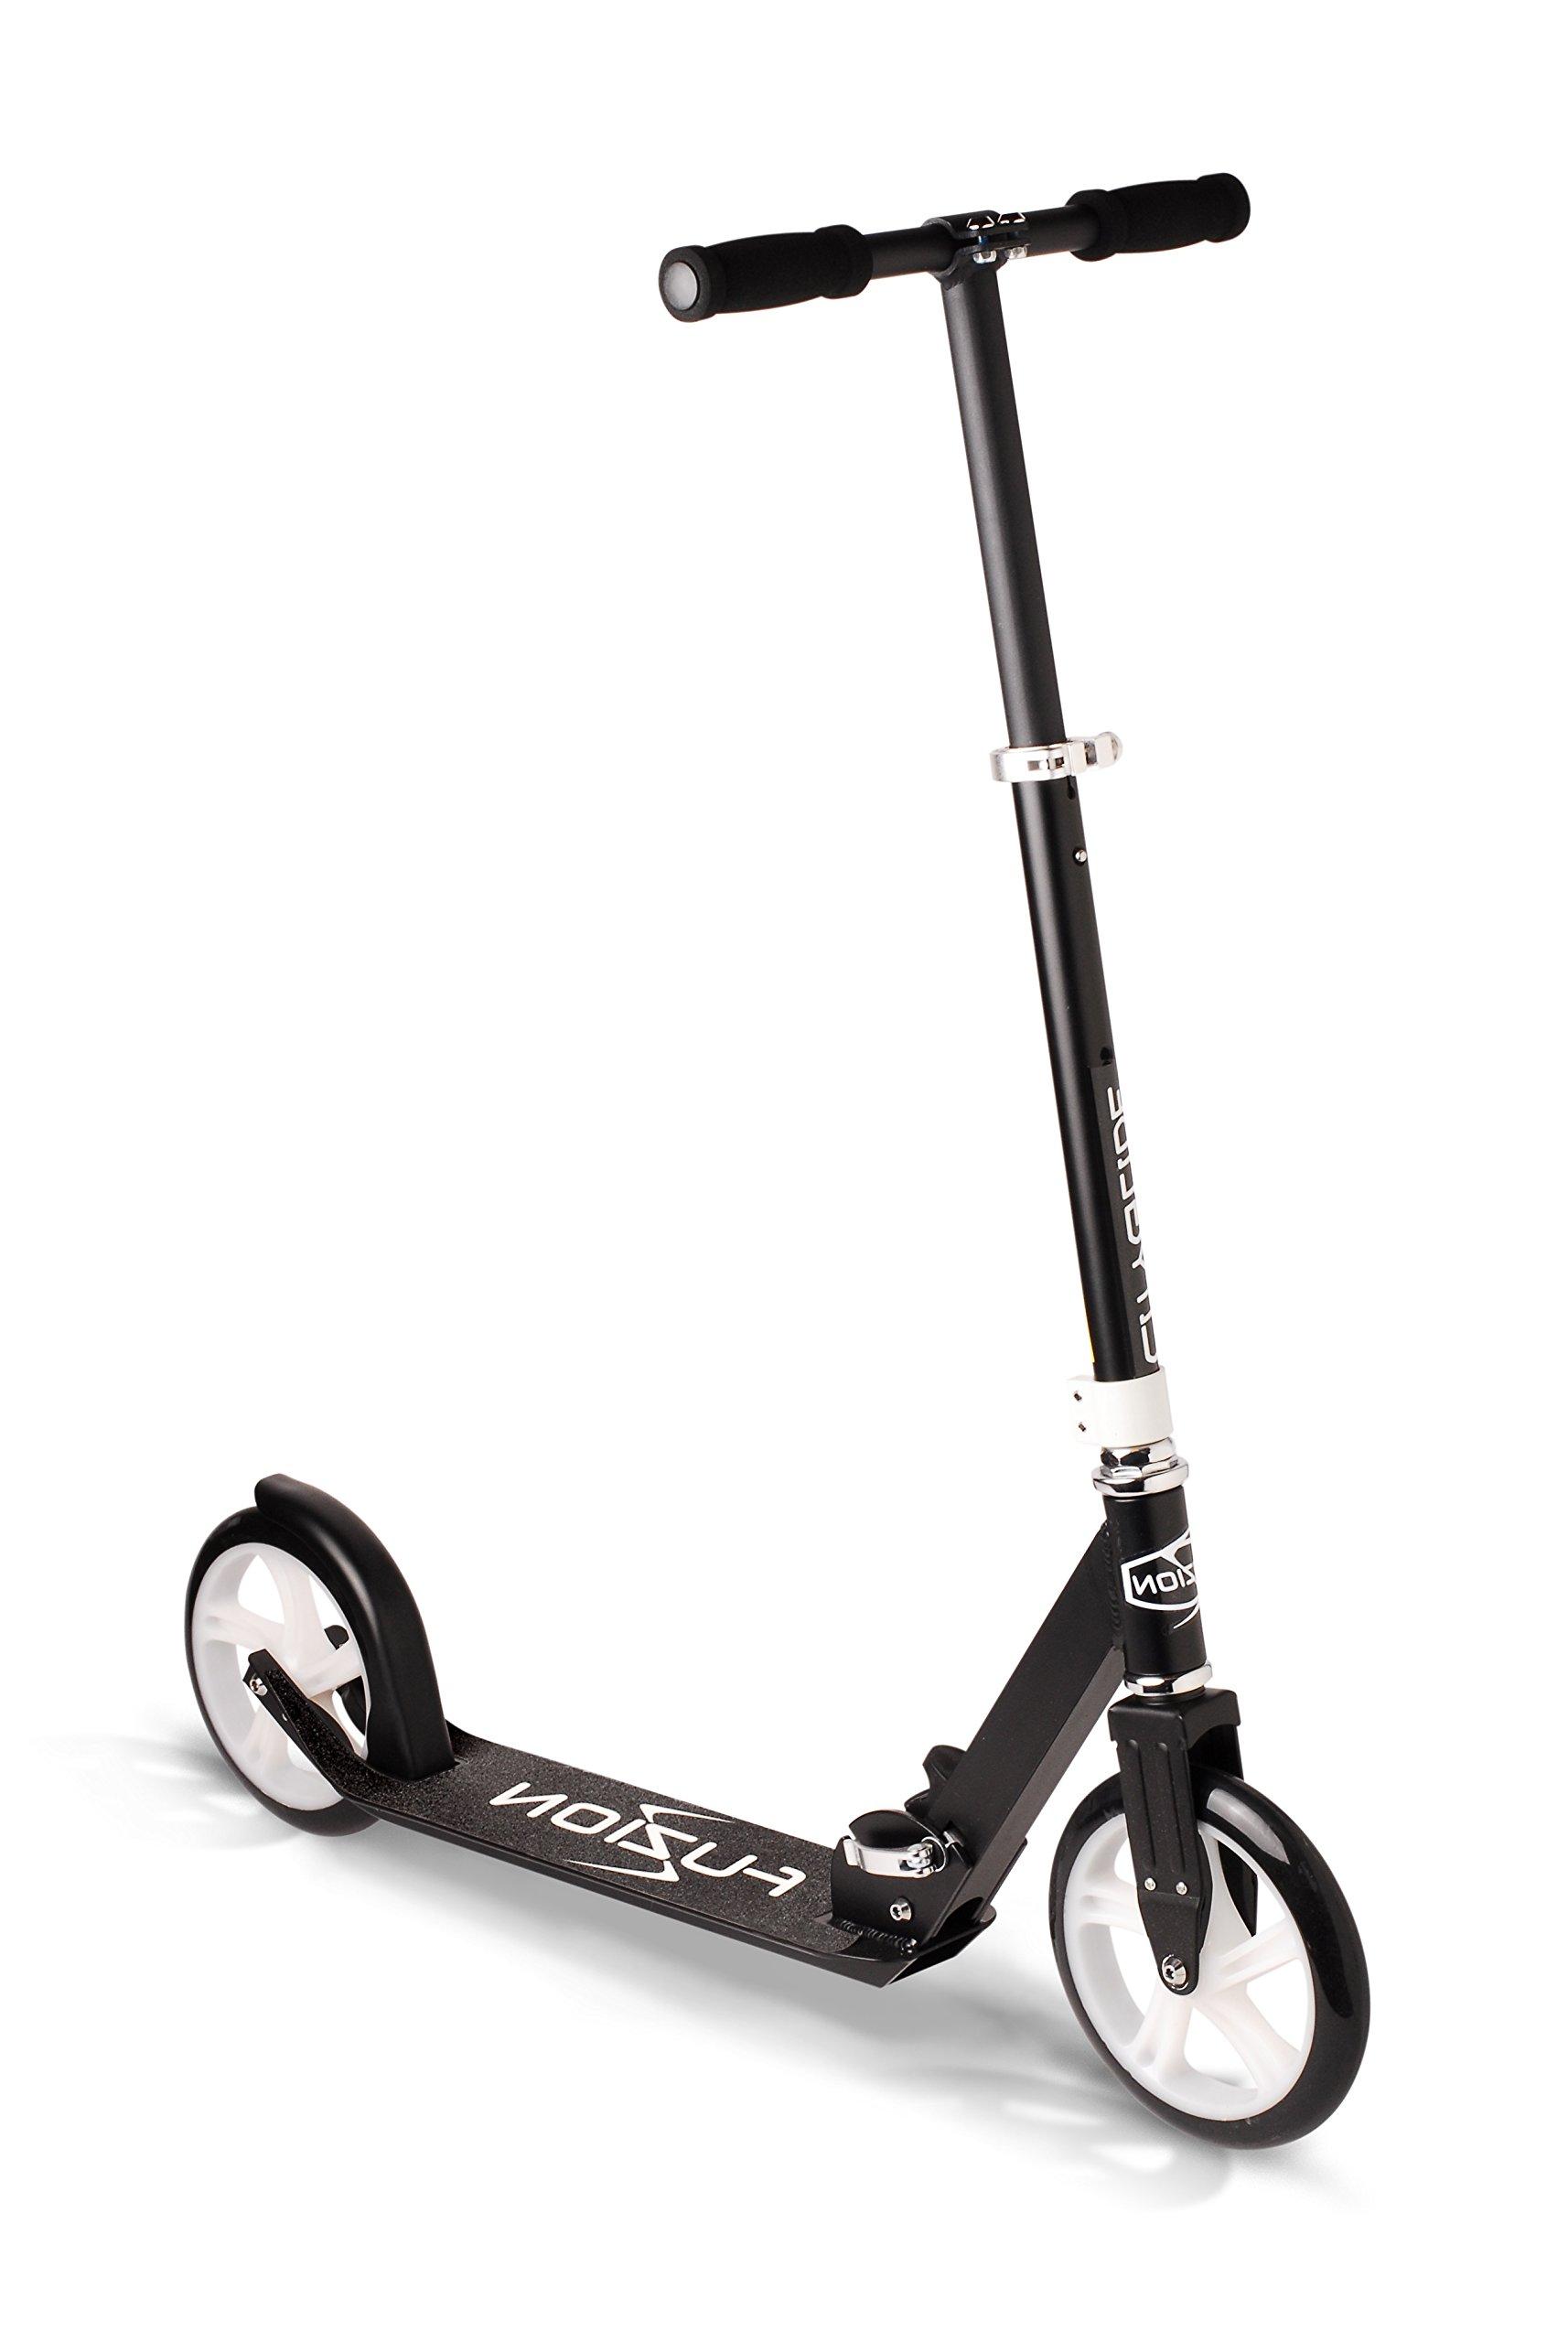 Fuzion Cityglide Adult Kick Scooter (Black)